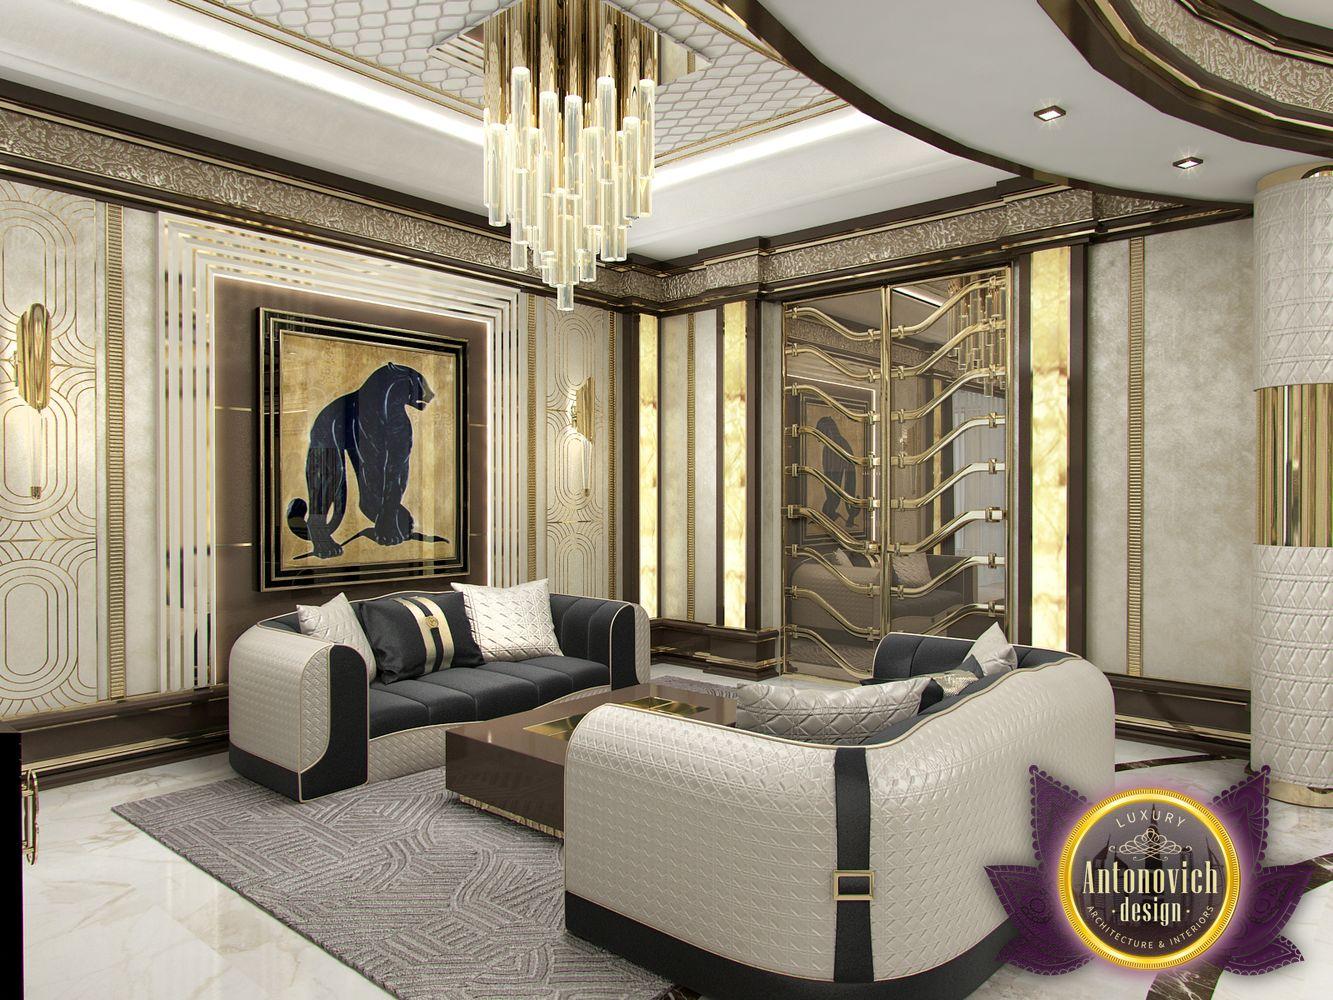 Bedroom Ideas: LUXURY ANTONOVICH DESIGN UAE: Master Bedroom In Modern